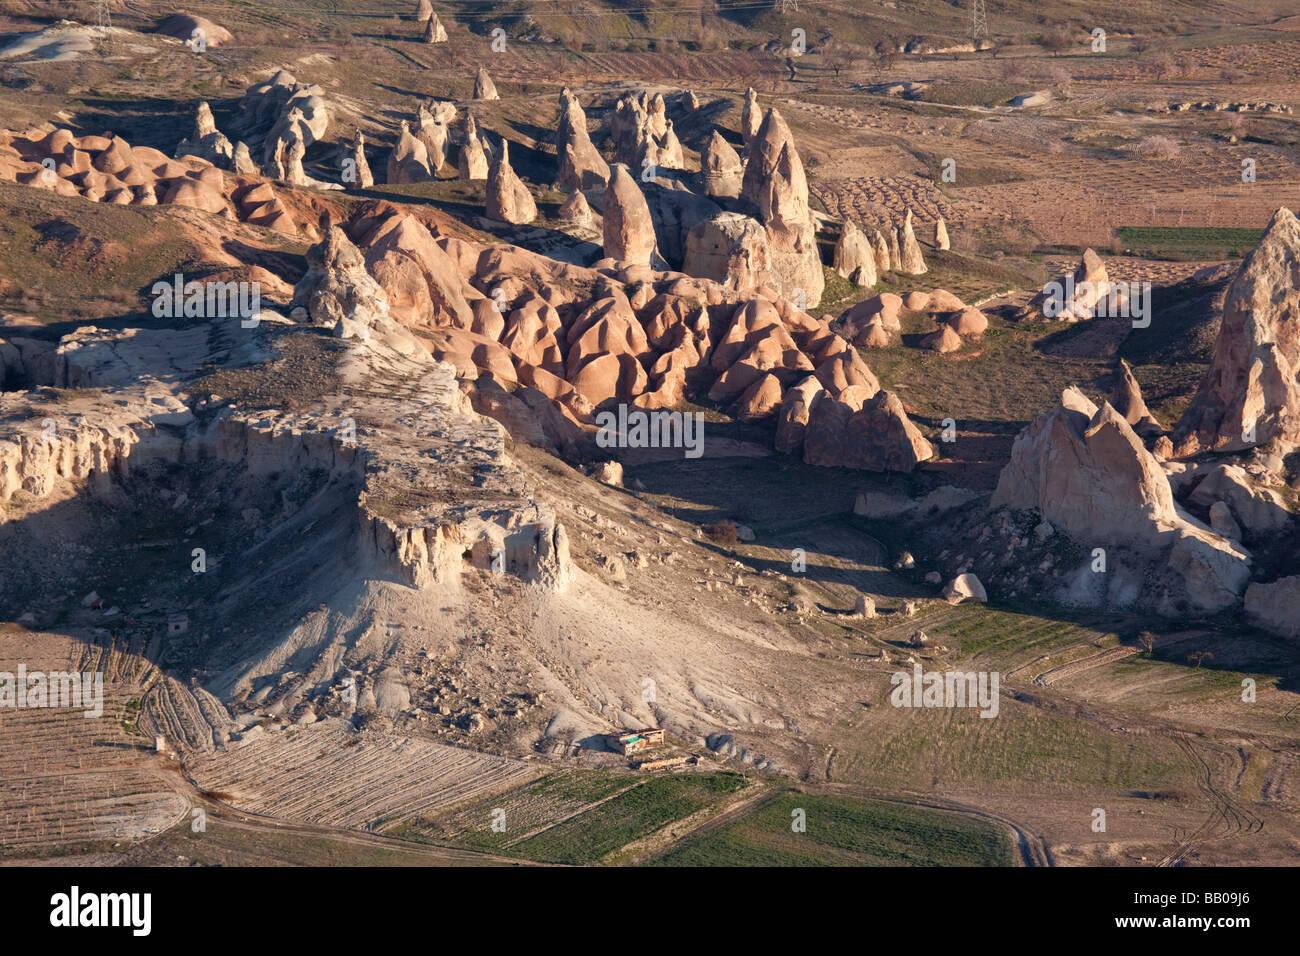 Rugged terrain and fairy chimneys at Cappadocia Turkey - Stock Image